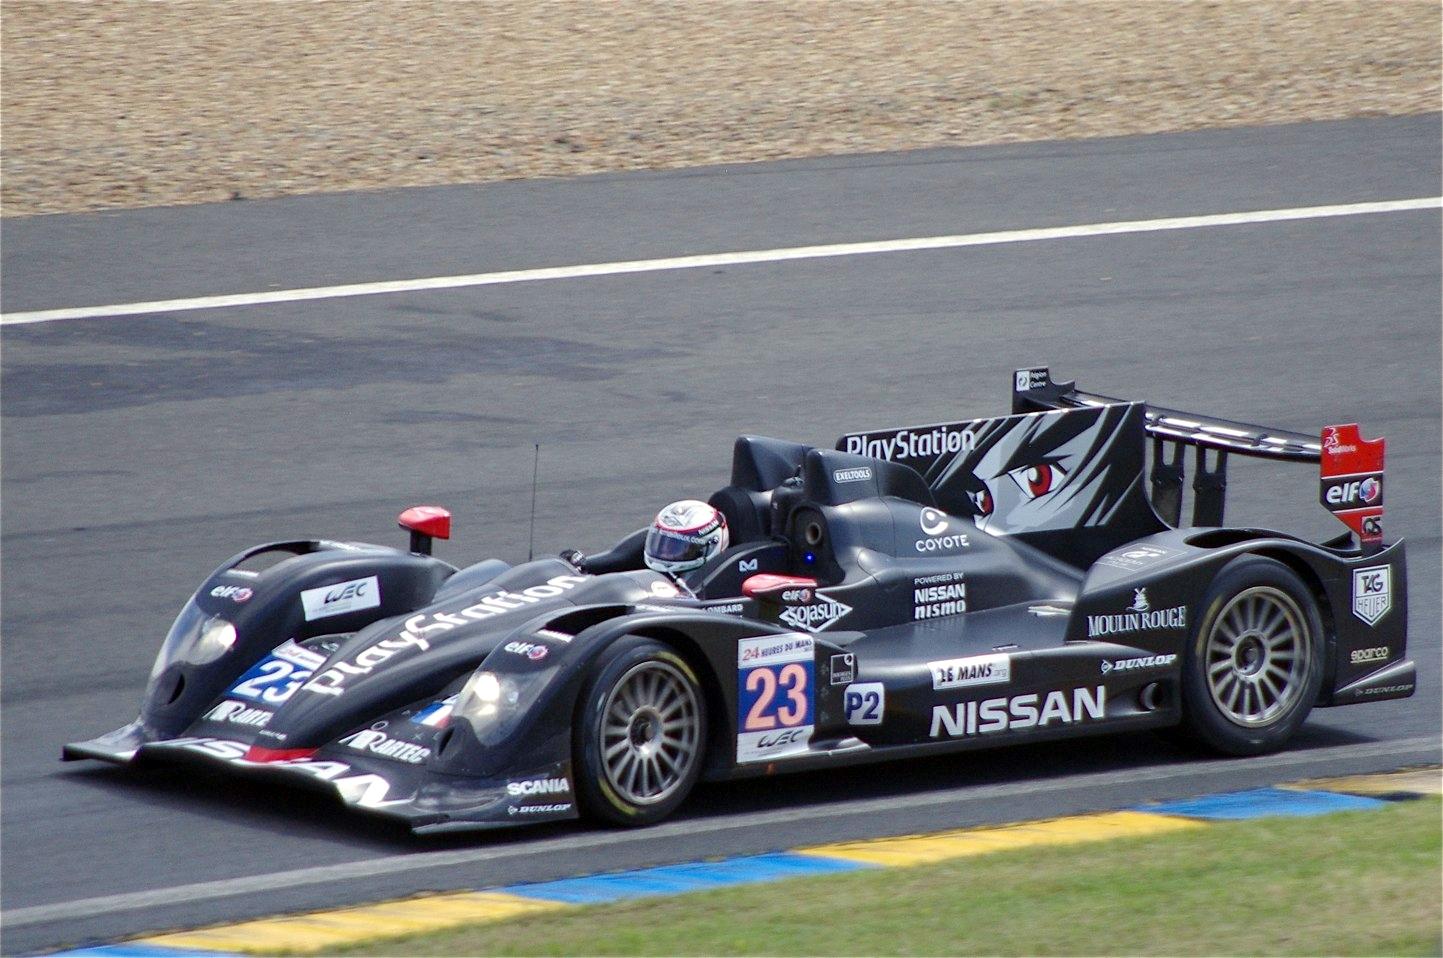 Oreca_03_Nissan_Signatech-Nissan_%2823%29_Le_Mans_2012.jpg